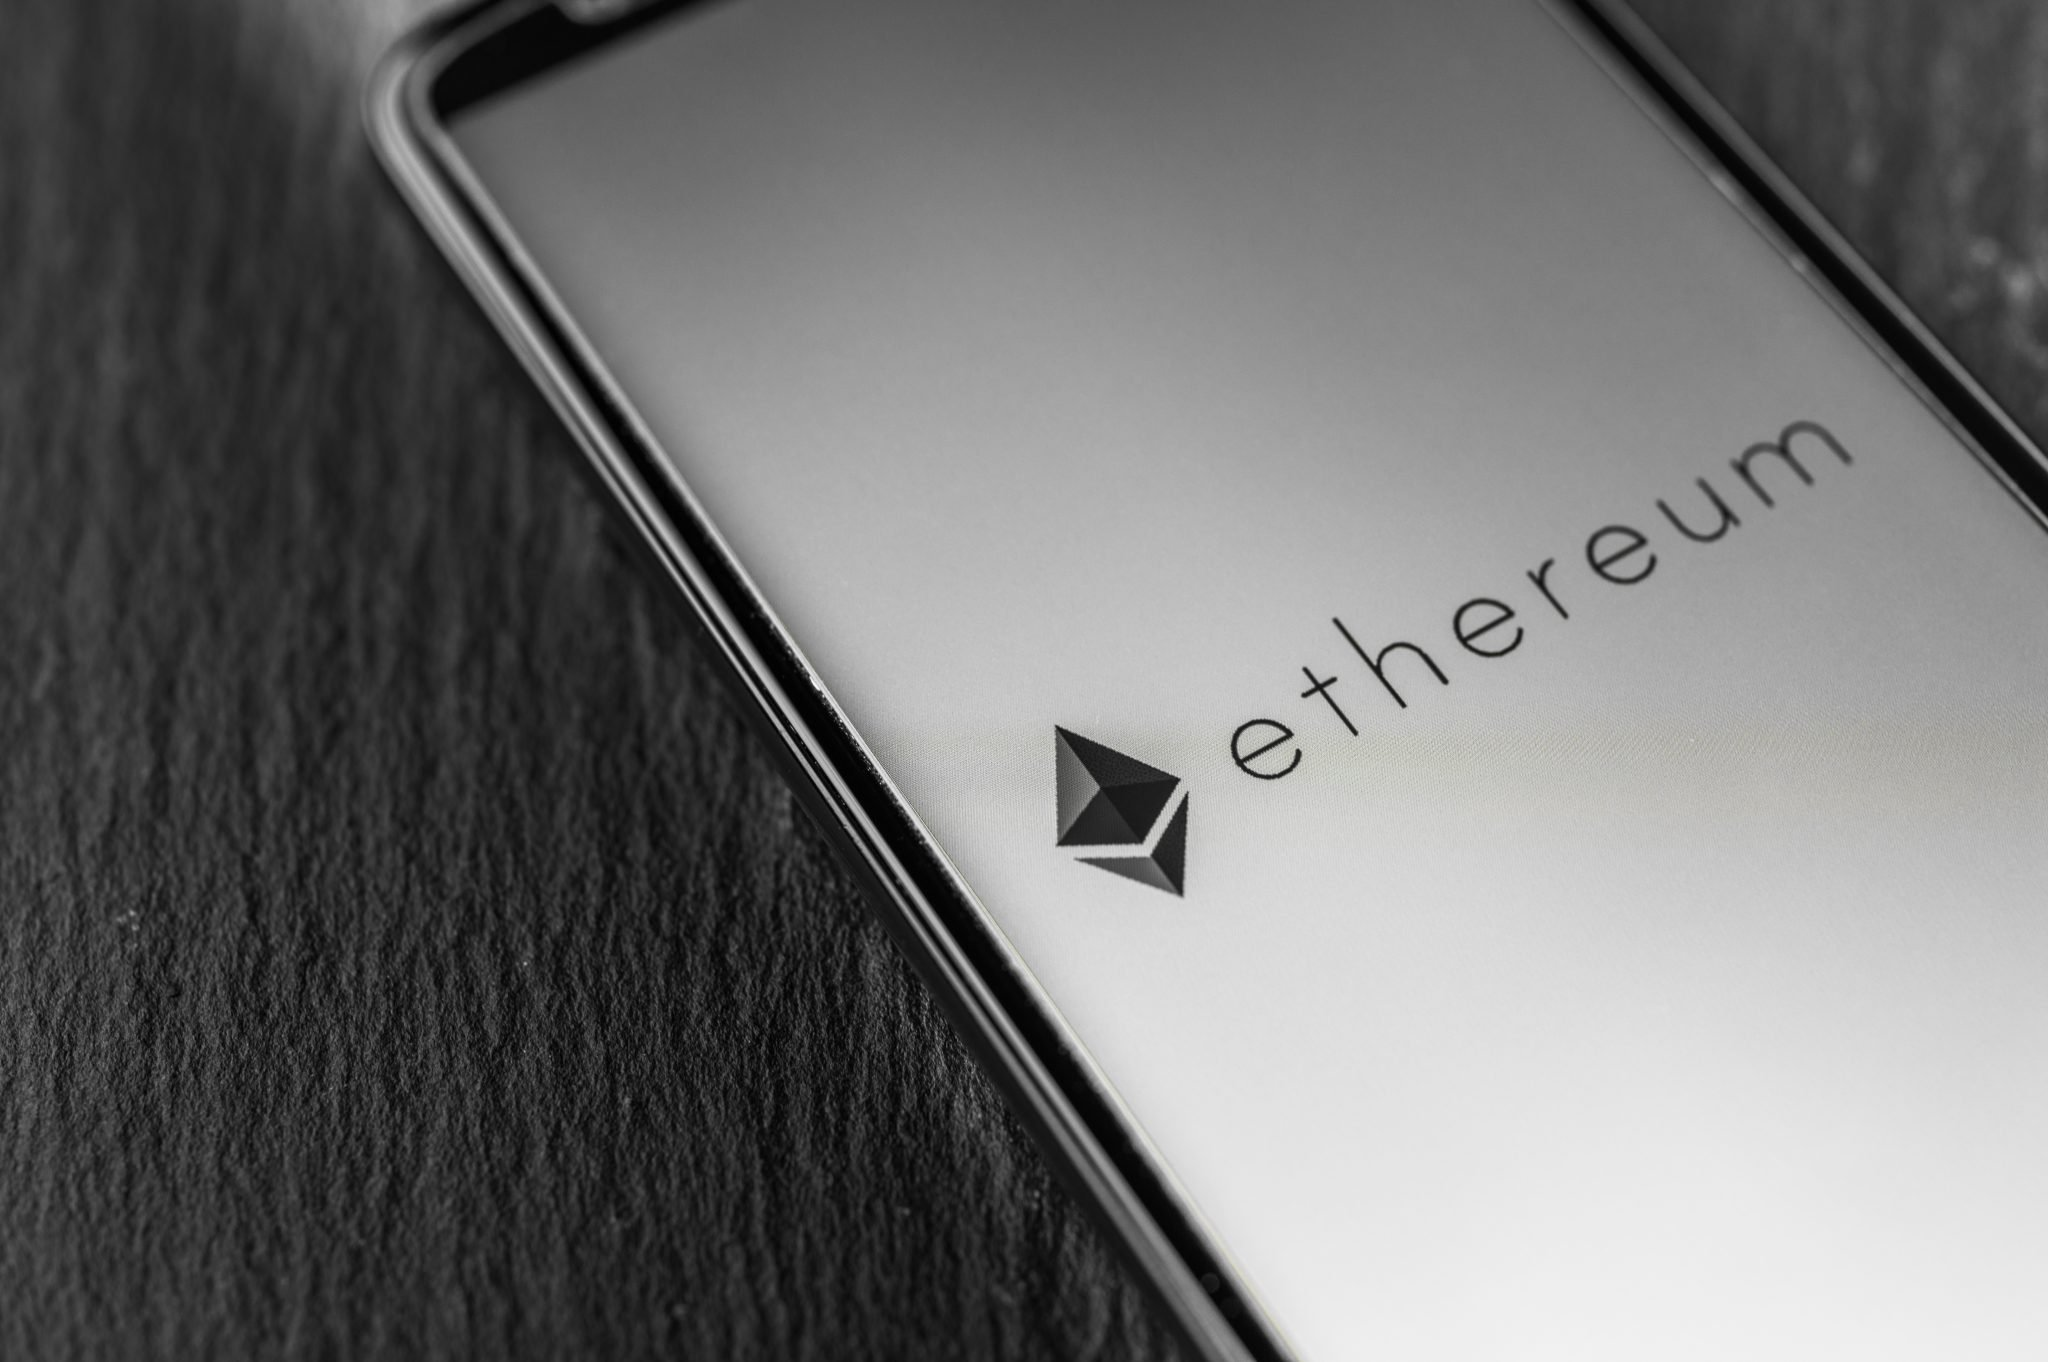 Logo of Ethereum blockchain money cryptocurrency on screen of smartphone.